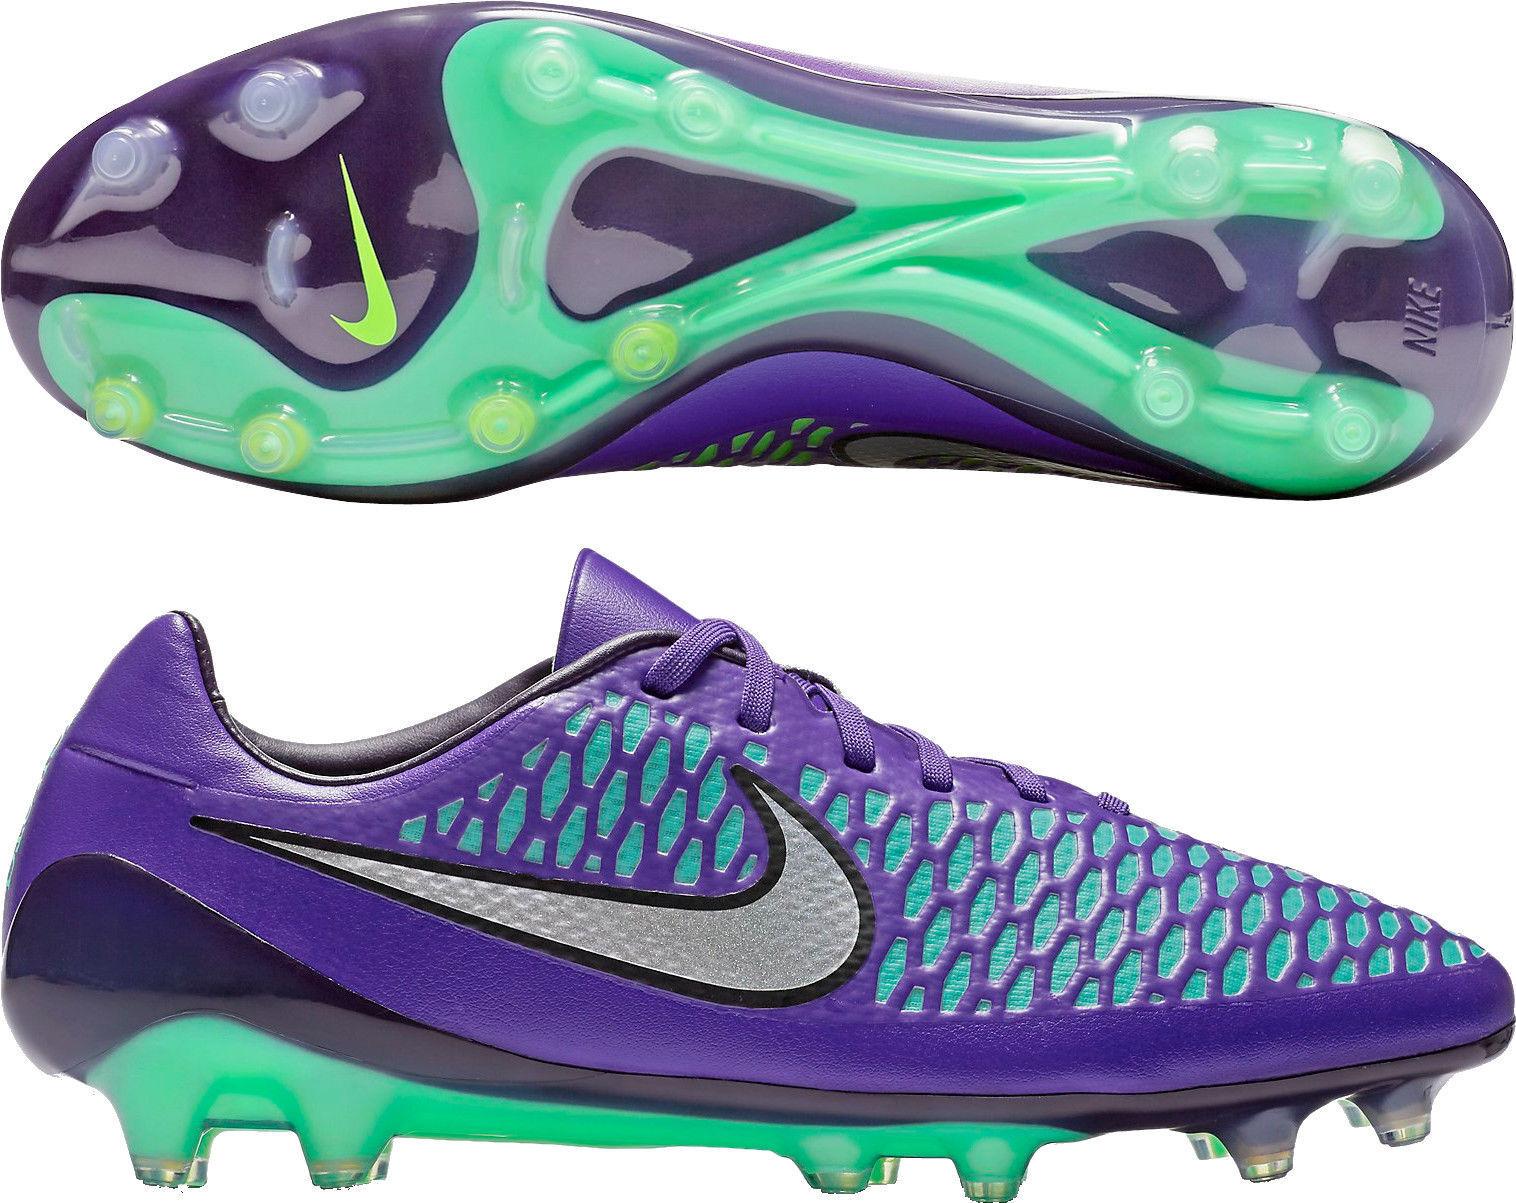 Nike Opus Magista Fg Pista Dura Acc Acc Acc Fútbol Tacos 649230-505 Sz 7.5 26cbe7